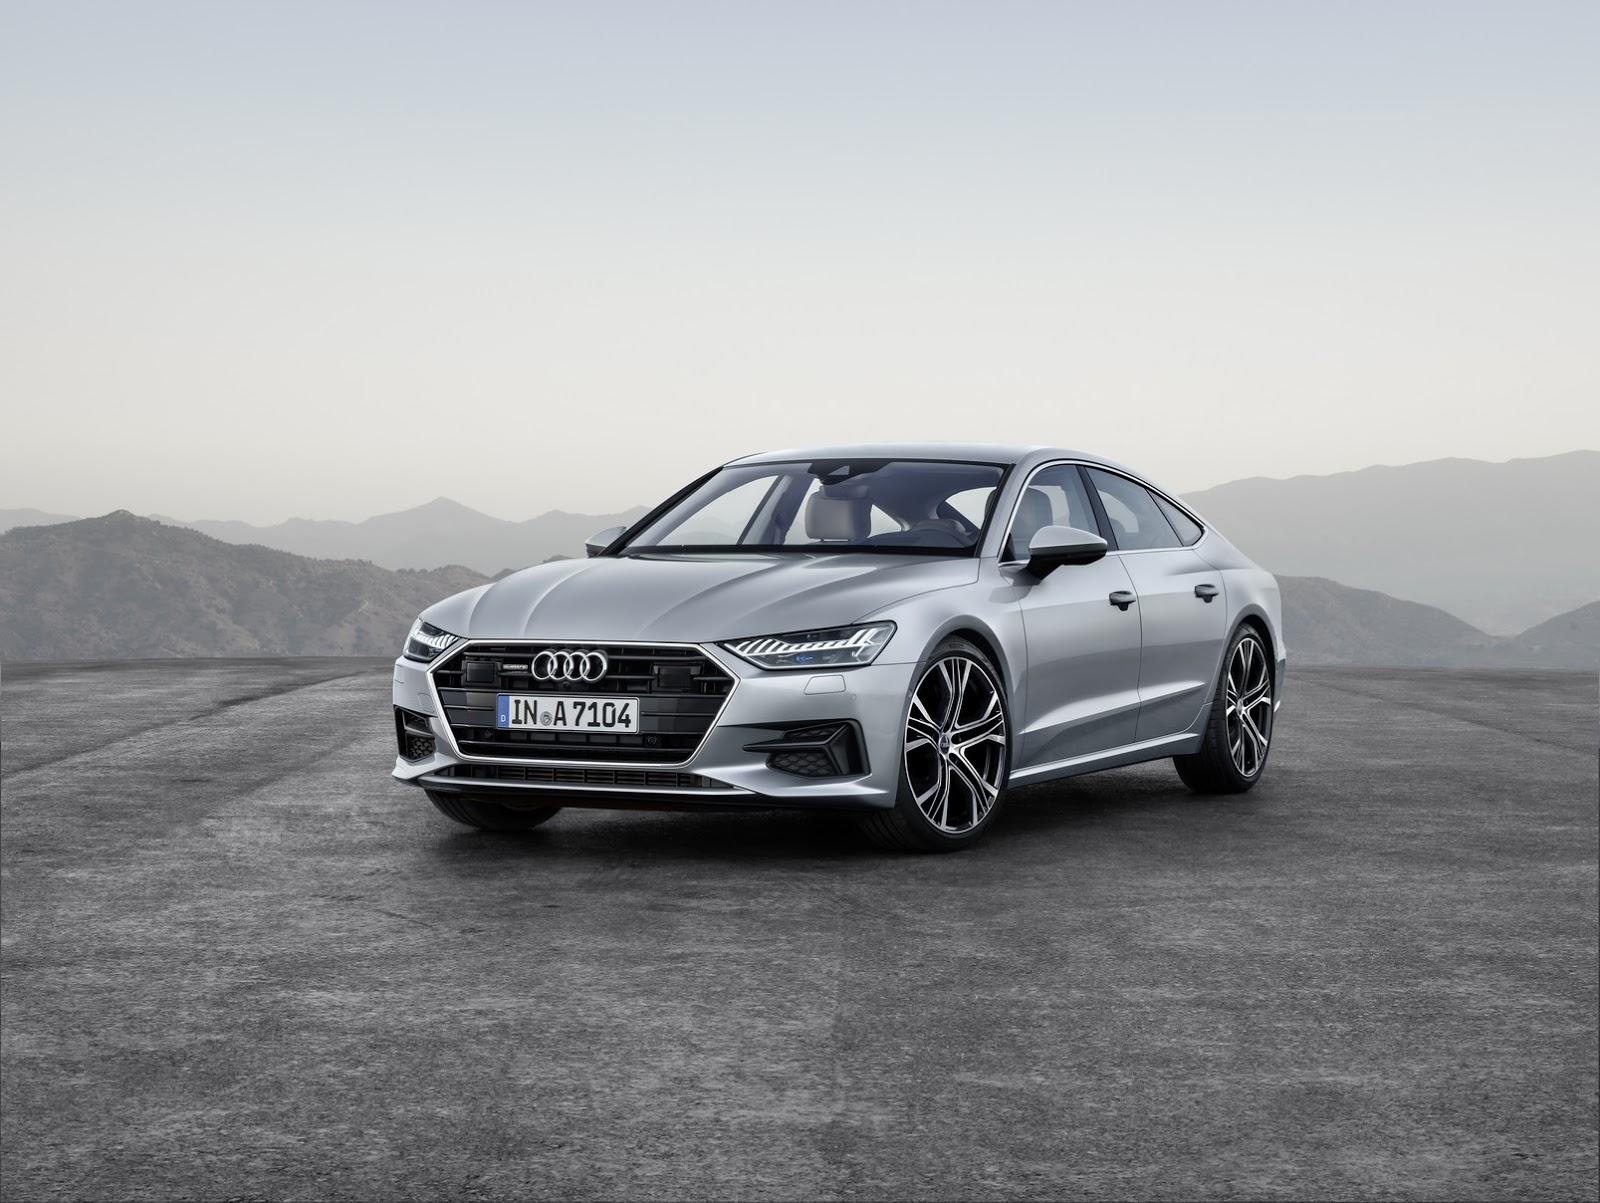 2018_Audi_A7_Sportback_0010